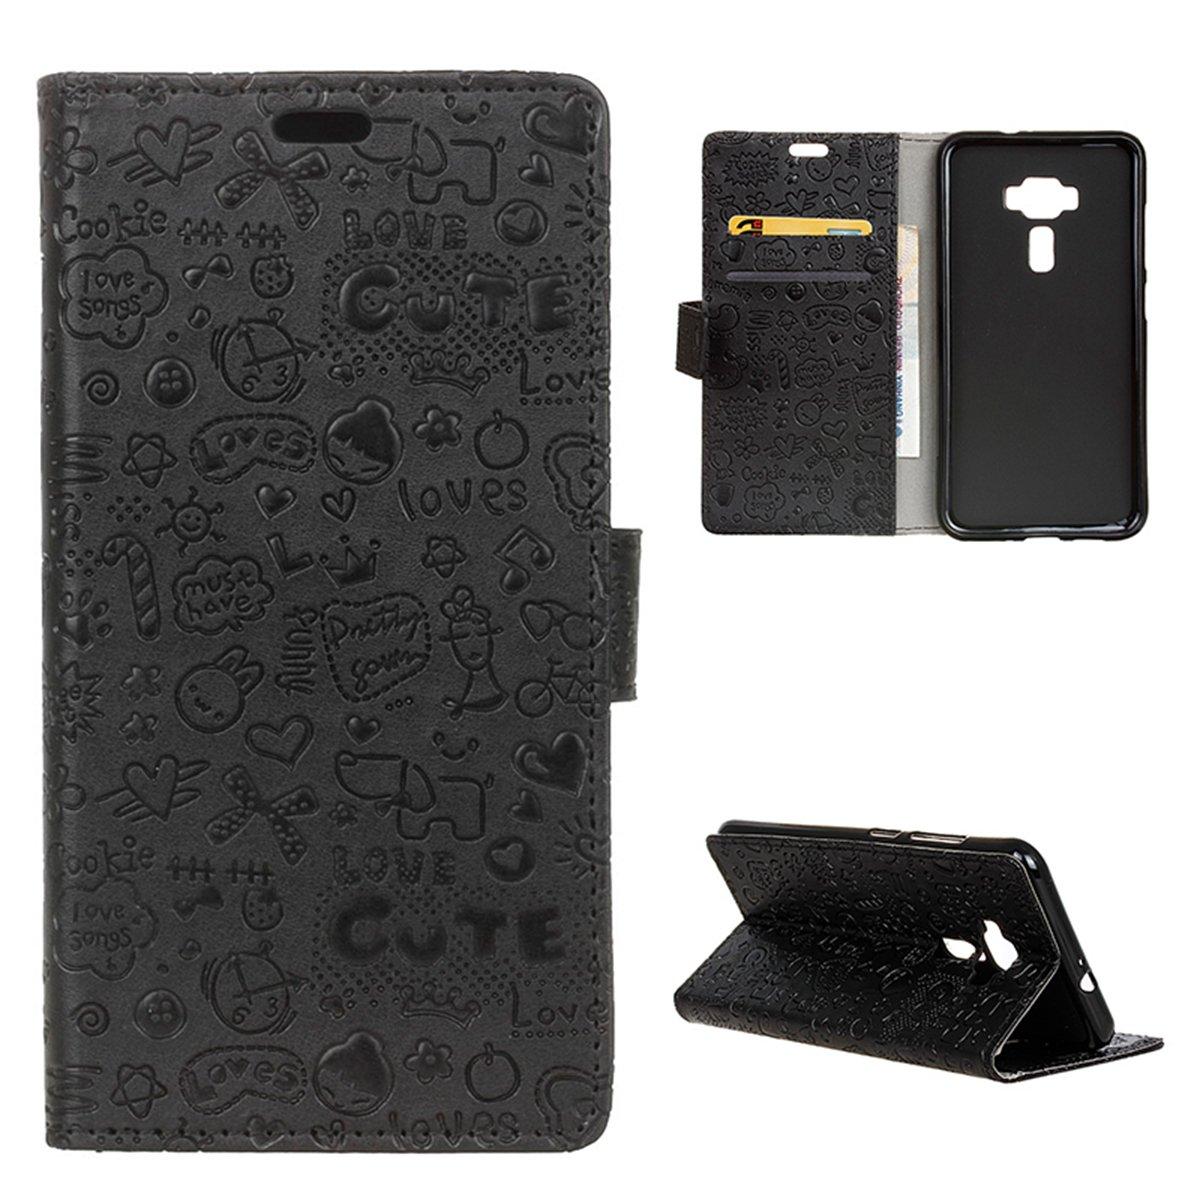 Asus ZenFone 3 Neo ZE520KL 5.2 Custodia, adorehouse Custodia a Libro in Pelle Cover Flip Case [Slot porta carta] [Supporto] Portafoglio Custodia per Asus ZenFone 3 Neo ZE520KL 5.2 (Bianca)